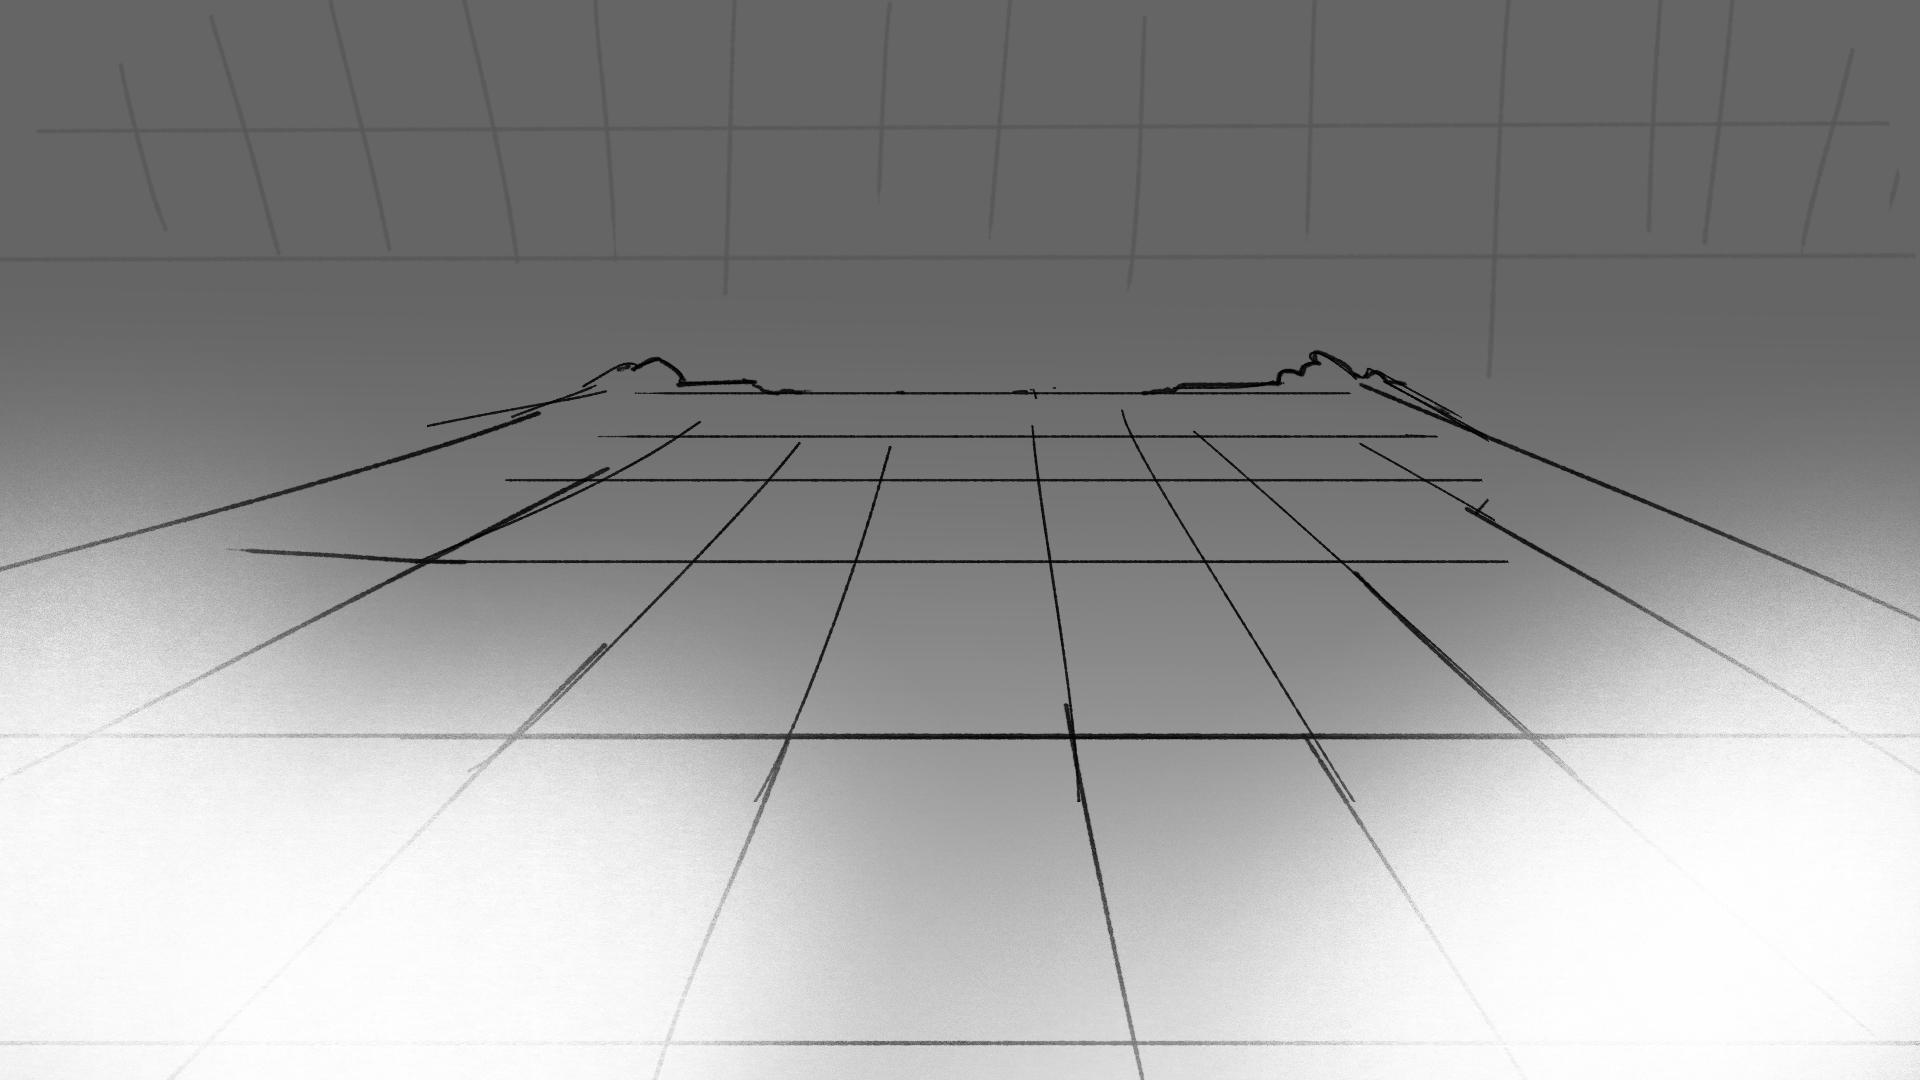 GreatC_Rooftop_089.jpg